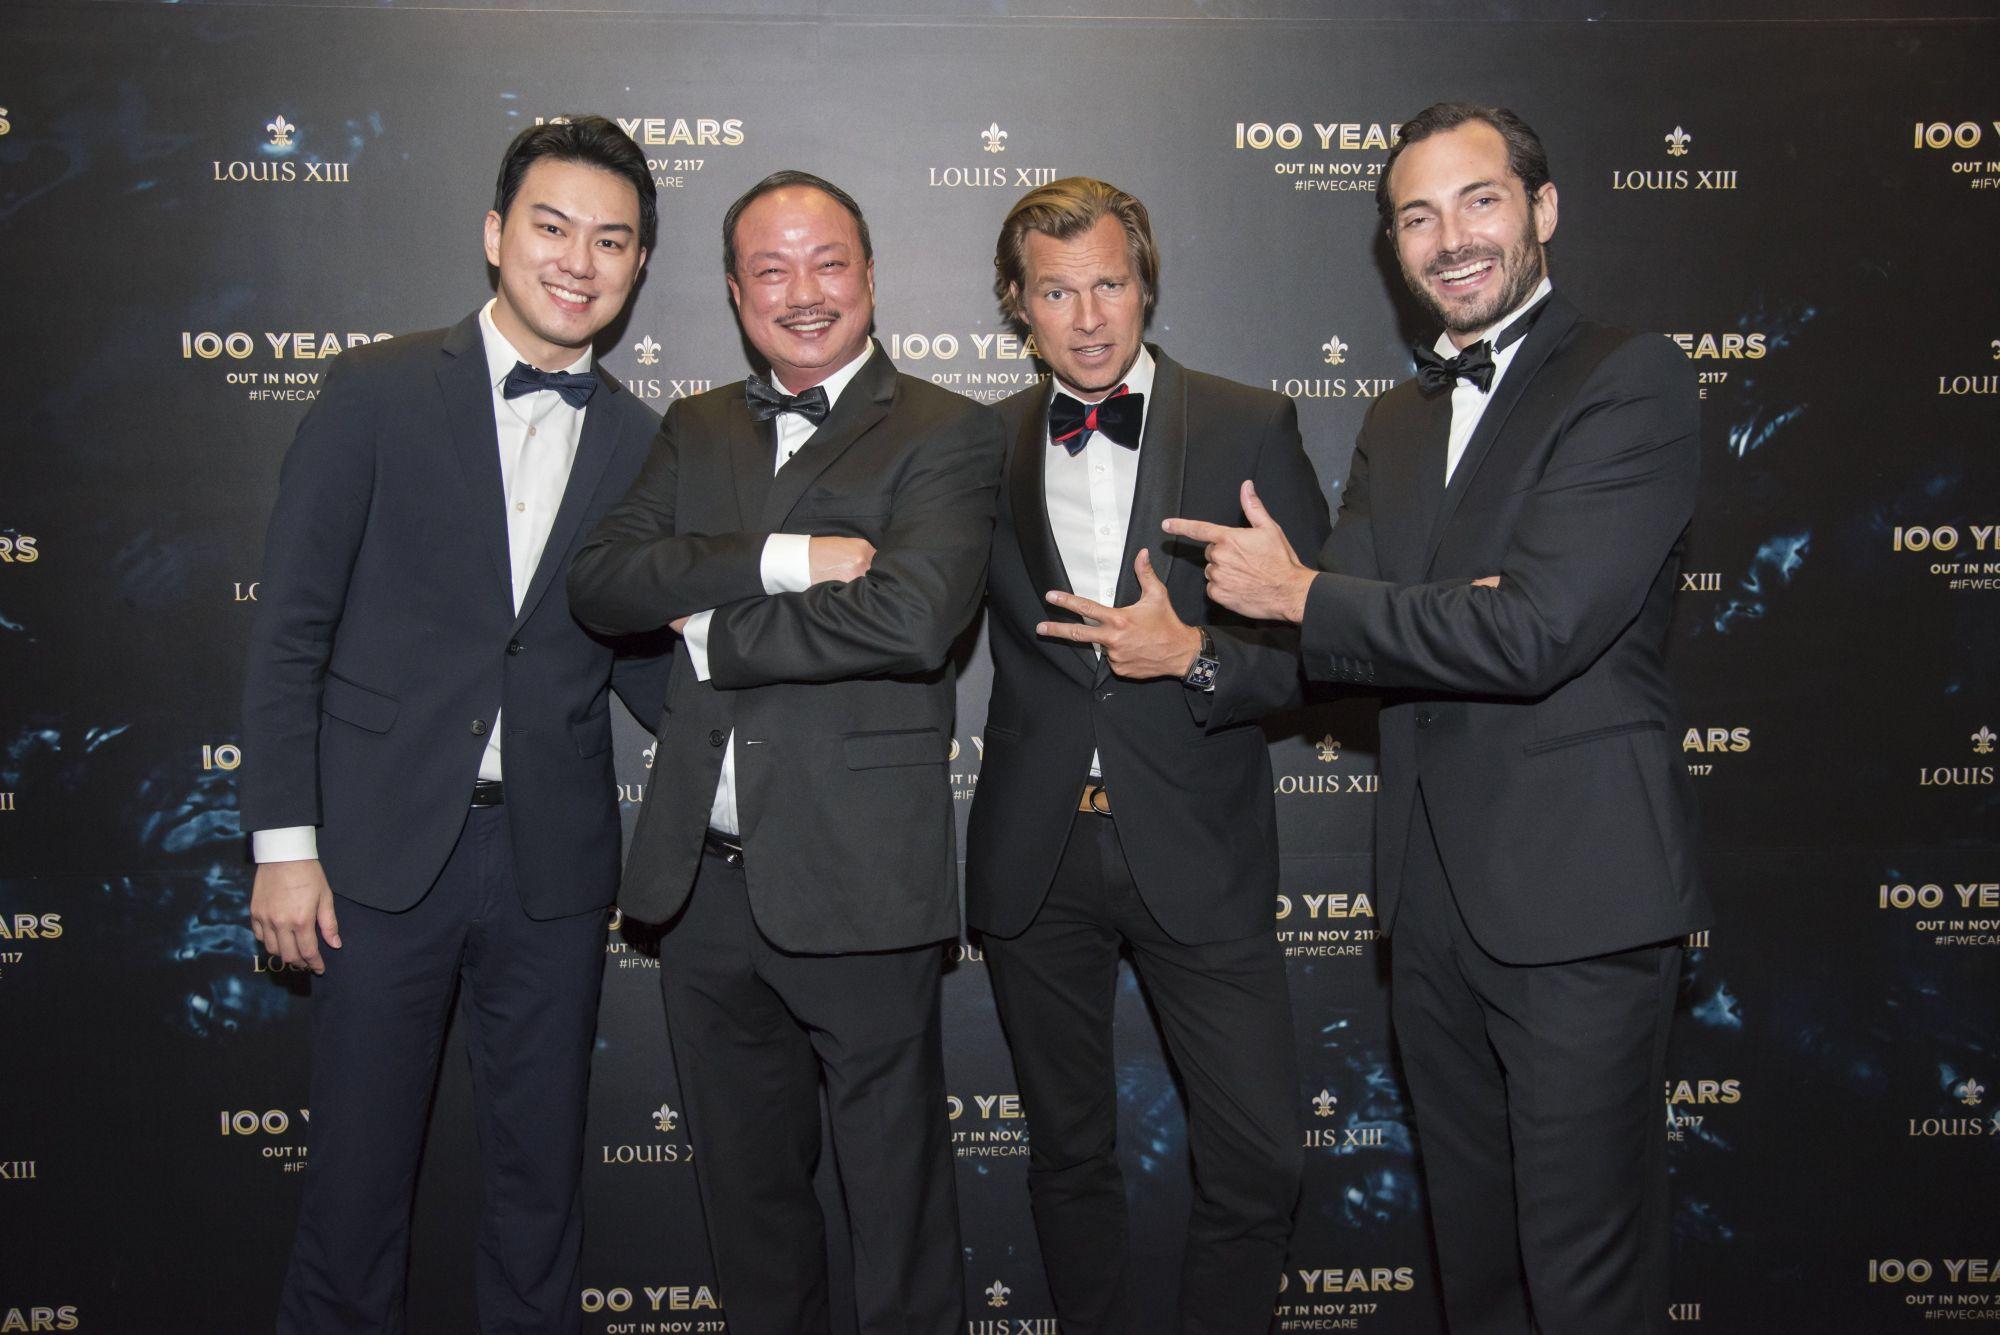 Nigel Lim, Lim Hock Leng, Ludovic du Plessis, Morgan de Prémorel